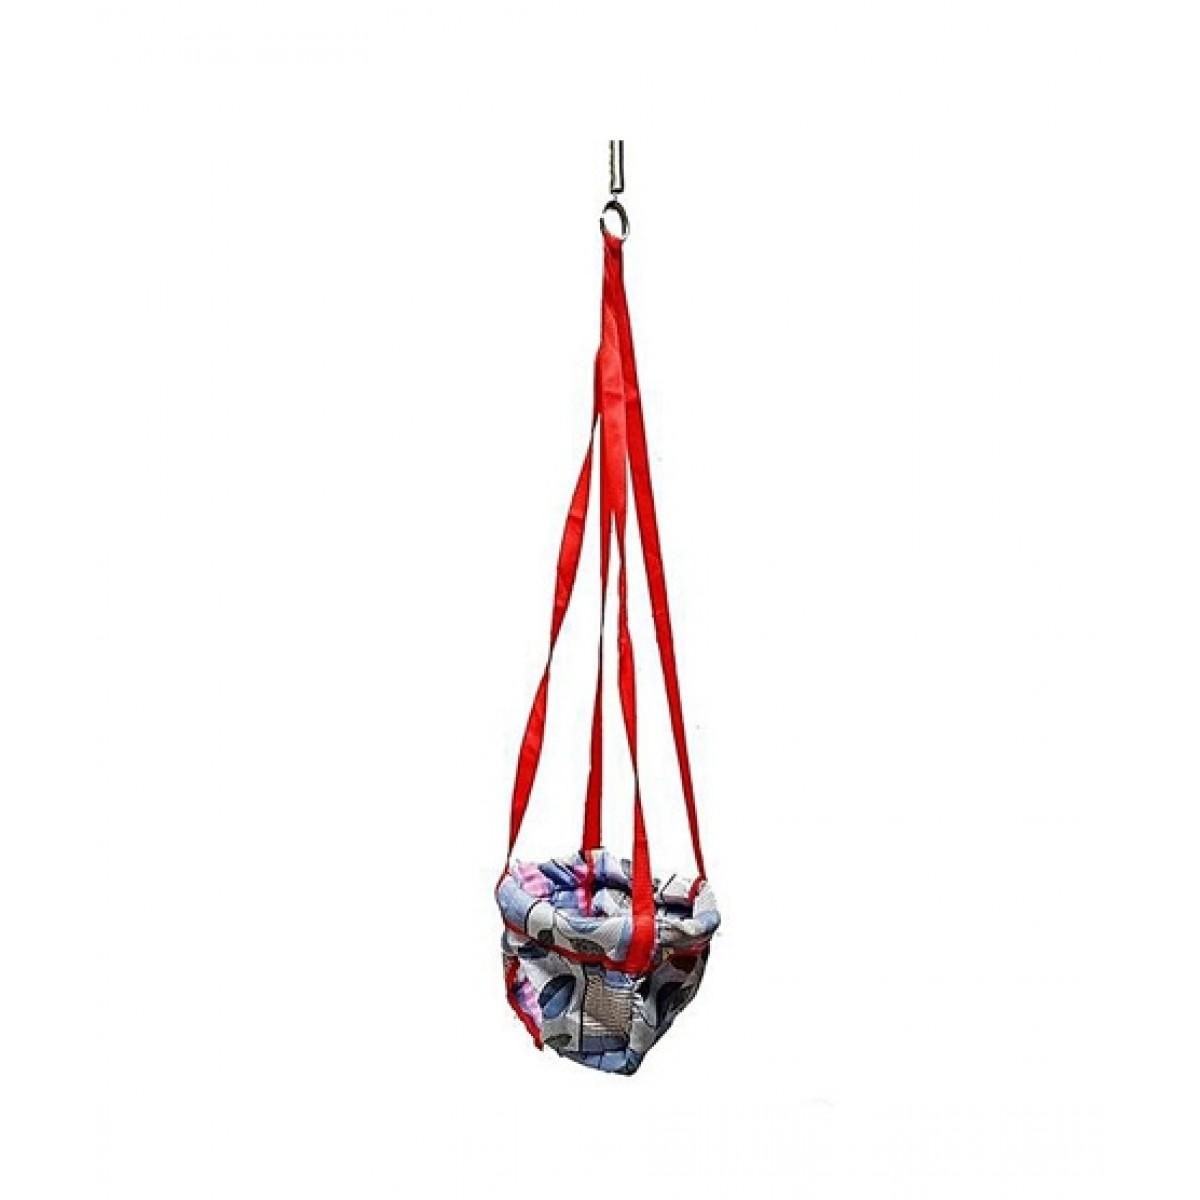 Israr Mall Indoor Hanging Baby Swing Price In Pakistan Buy Israr Mall Indoor Hanging Baby Swing Ishopping Pk